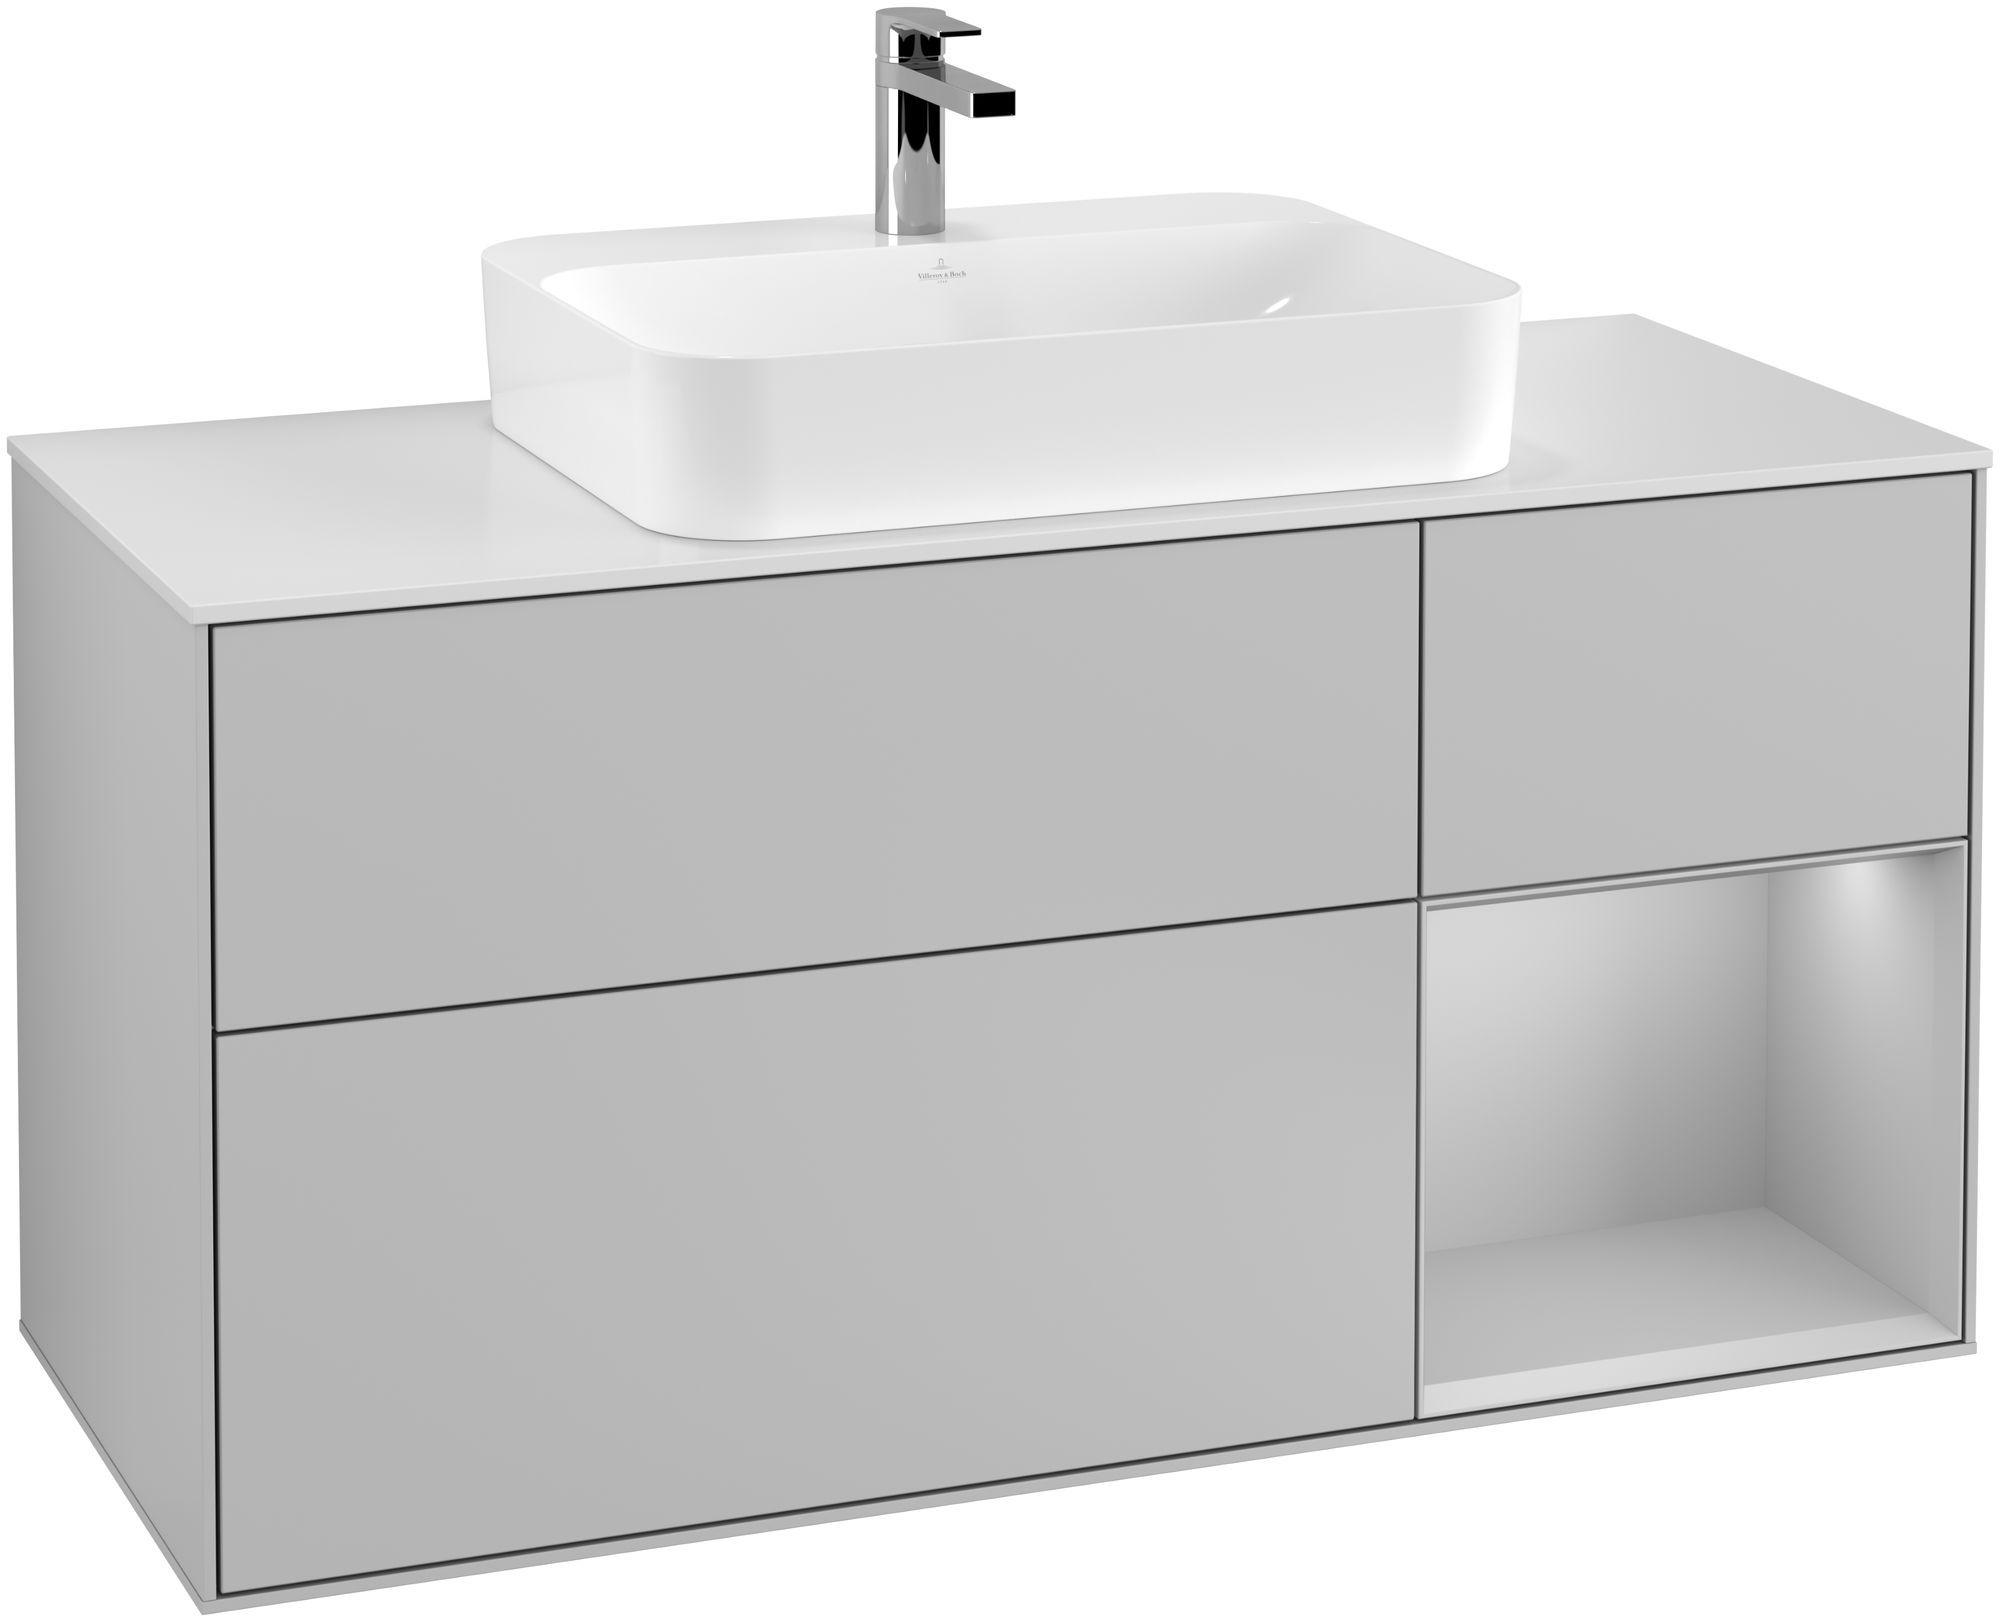 Villeroy & Boch Finion G42 Waschtischunterschrank mit Regalelement 3 Auszüge Waschtisch mittig LED-Beleuchtung B:120xH:60,3xT:50,1cm Front, Korpus: Light Grey Matt, Glasplatte: White Matt G421GJGJ